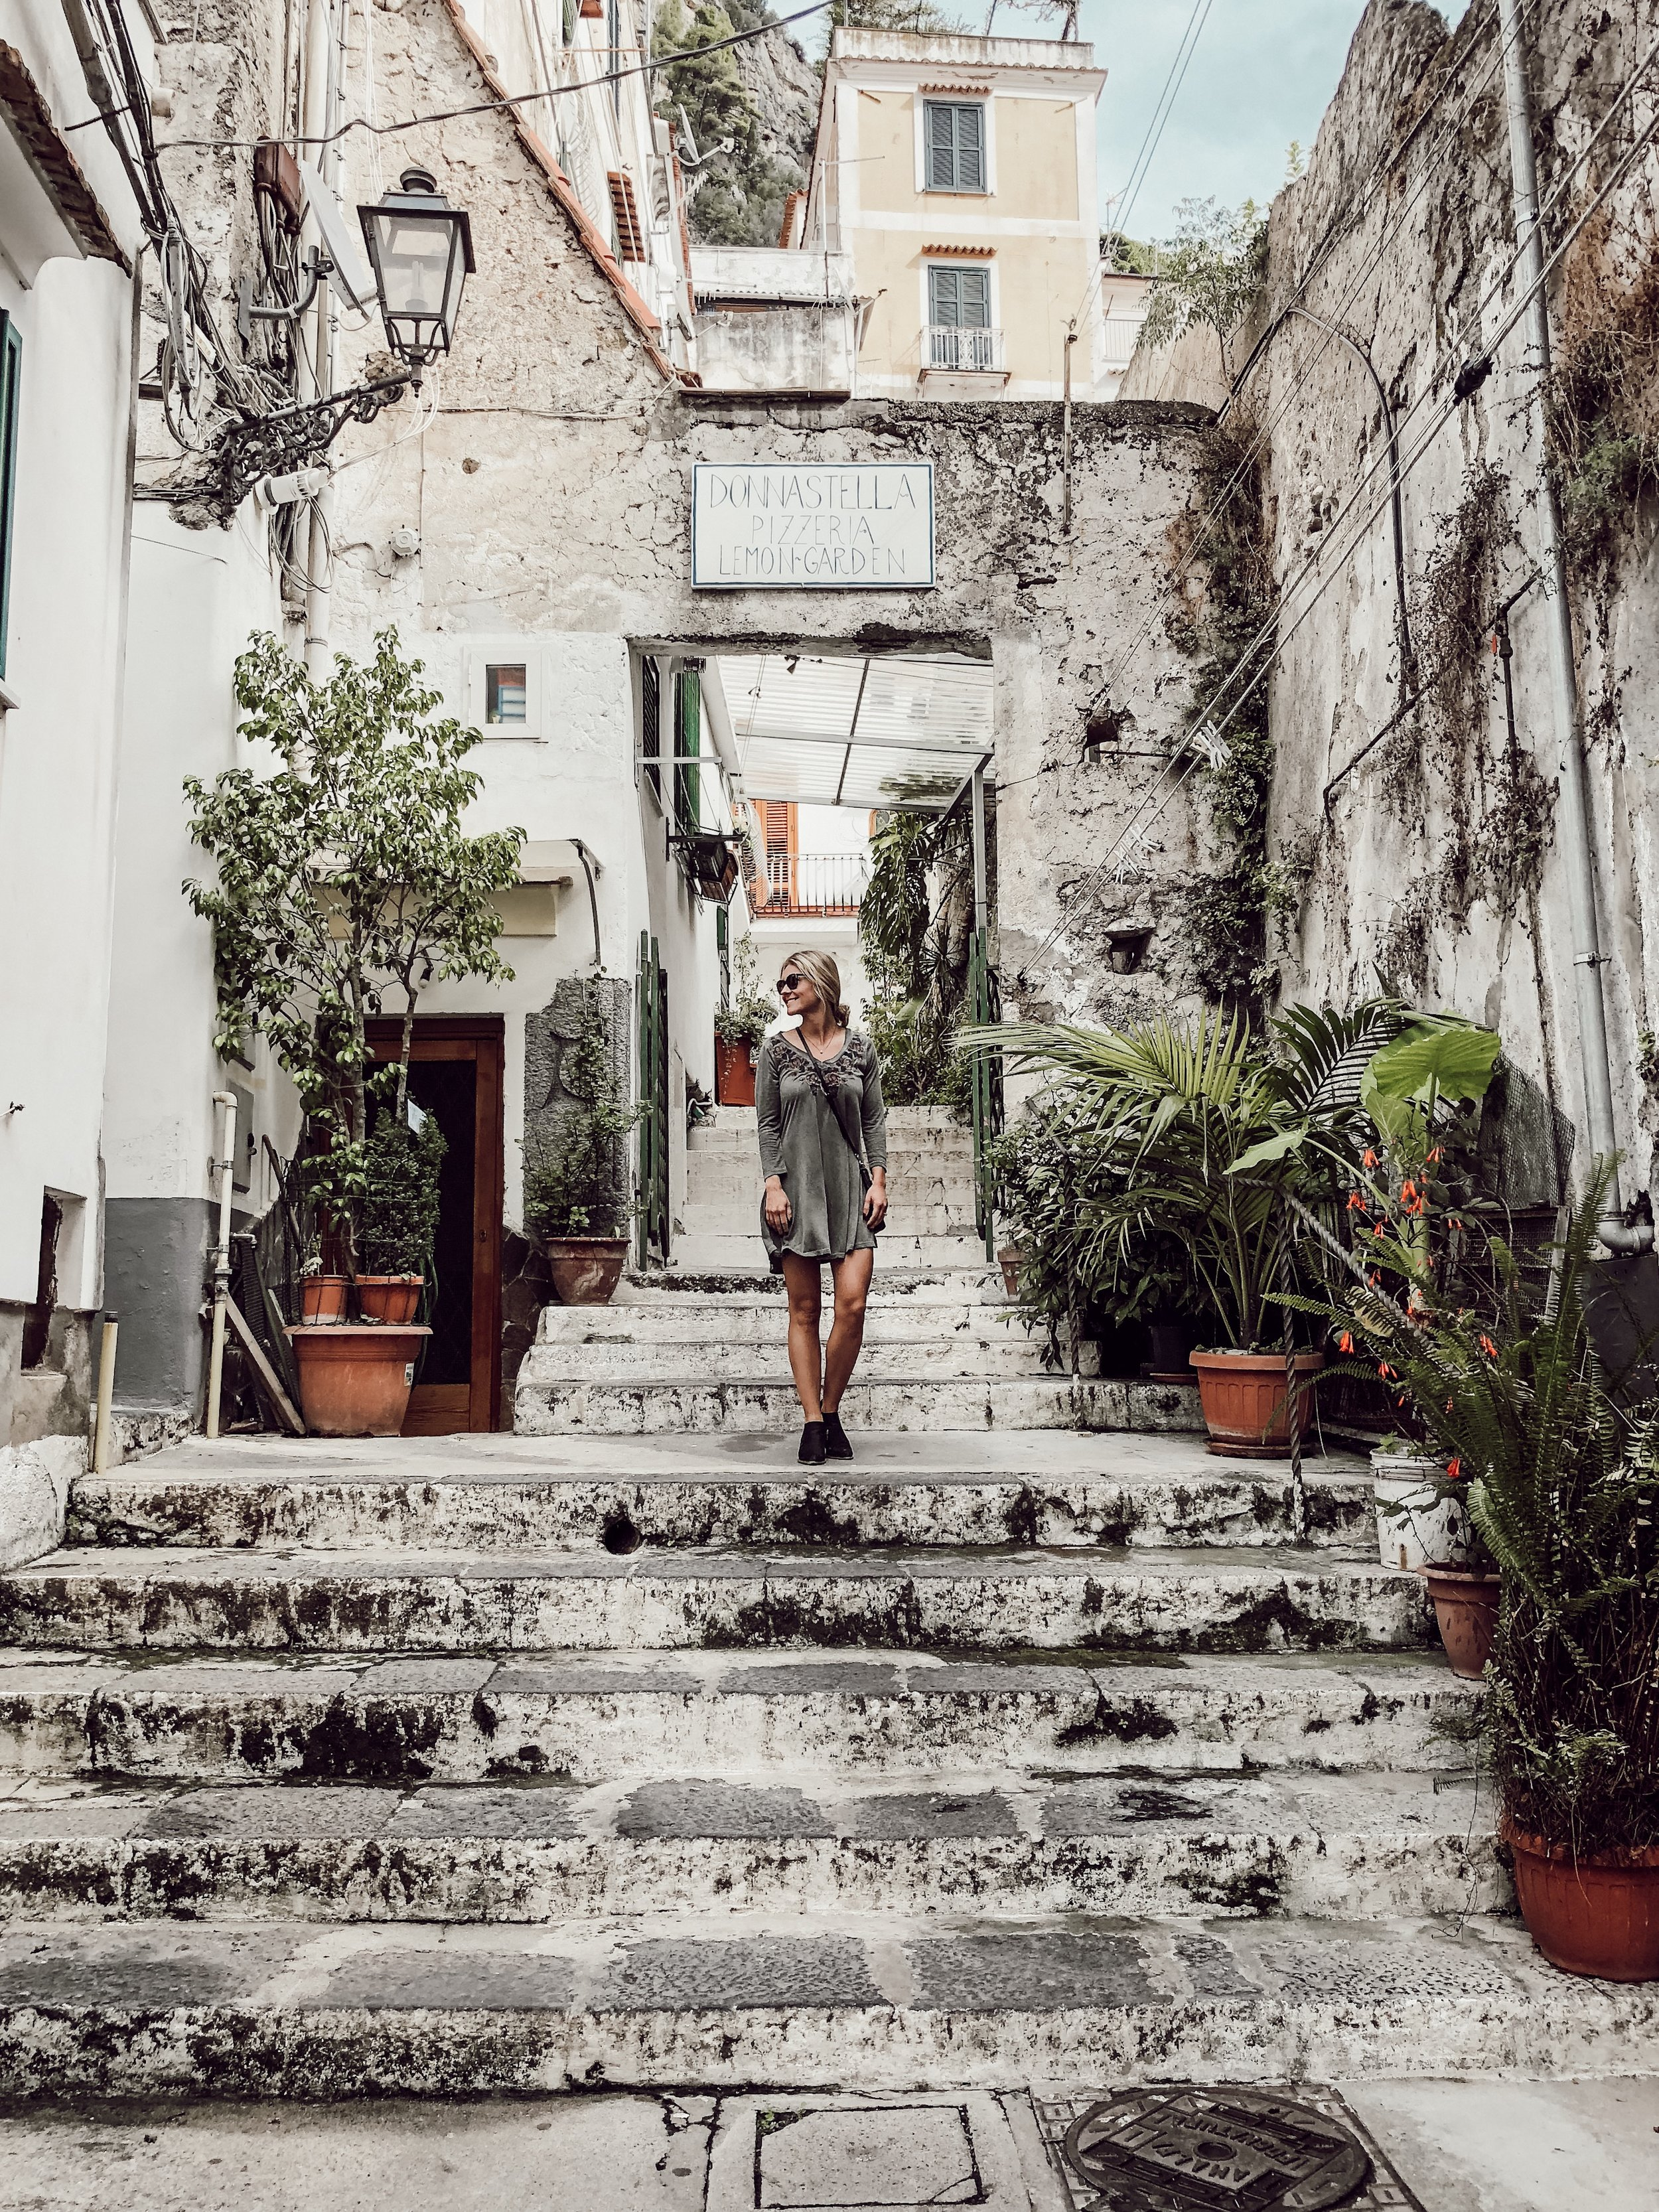 Donnastella Pizzeria and Lemon Garden Miranda | Three Days on the Amalfi Coast, Amalfi Travel Guide, What to Do in Amalfi Italy | Miranda Schroeder Blog